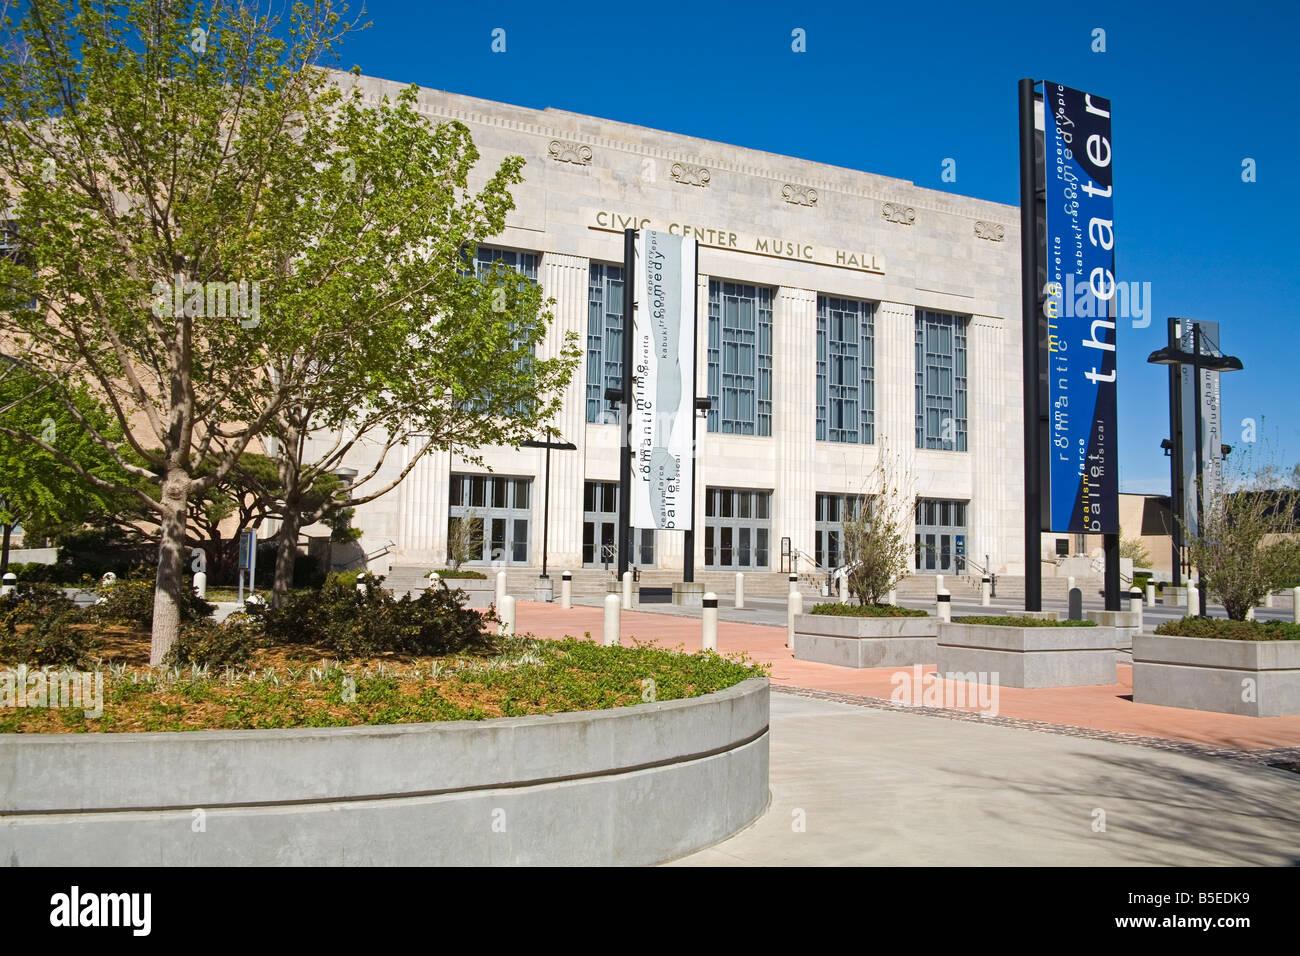 Civic Center Music Hall, Oklahoma City, Oklahoma, USA, North America - Stock Image